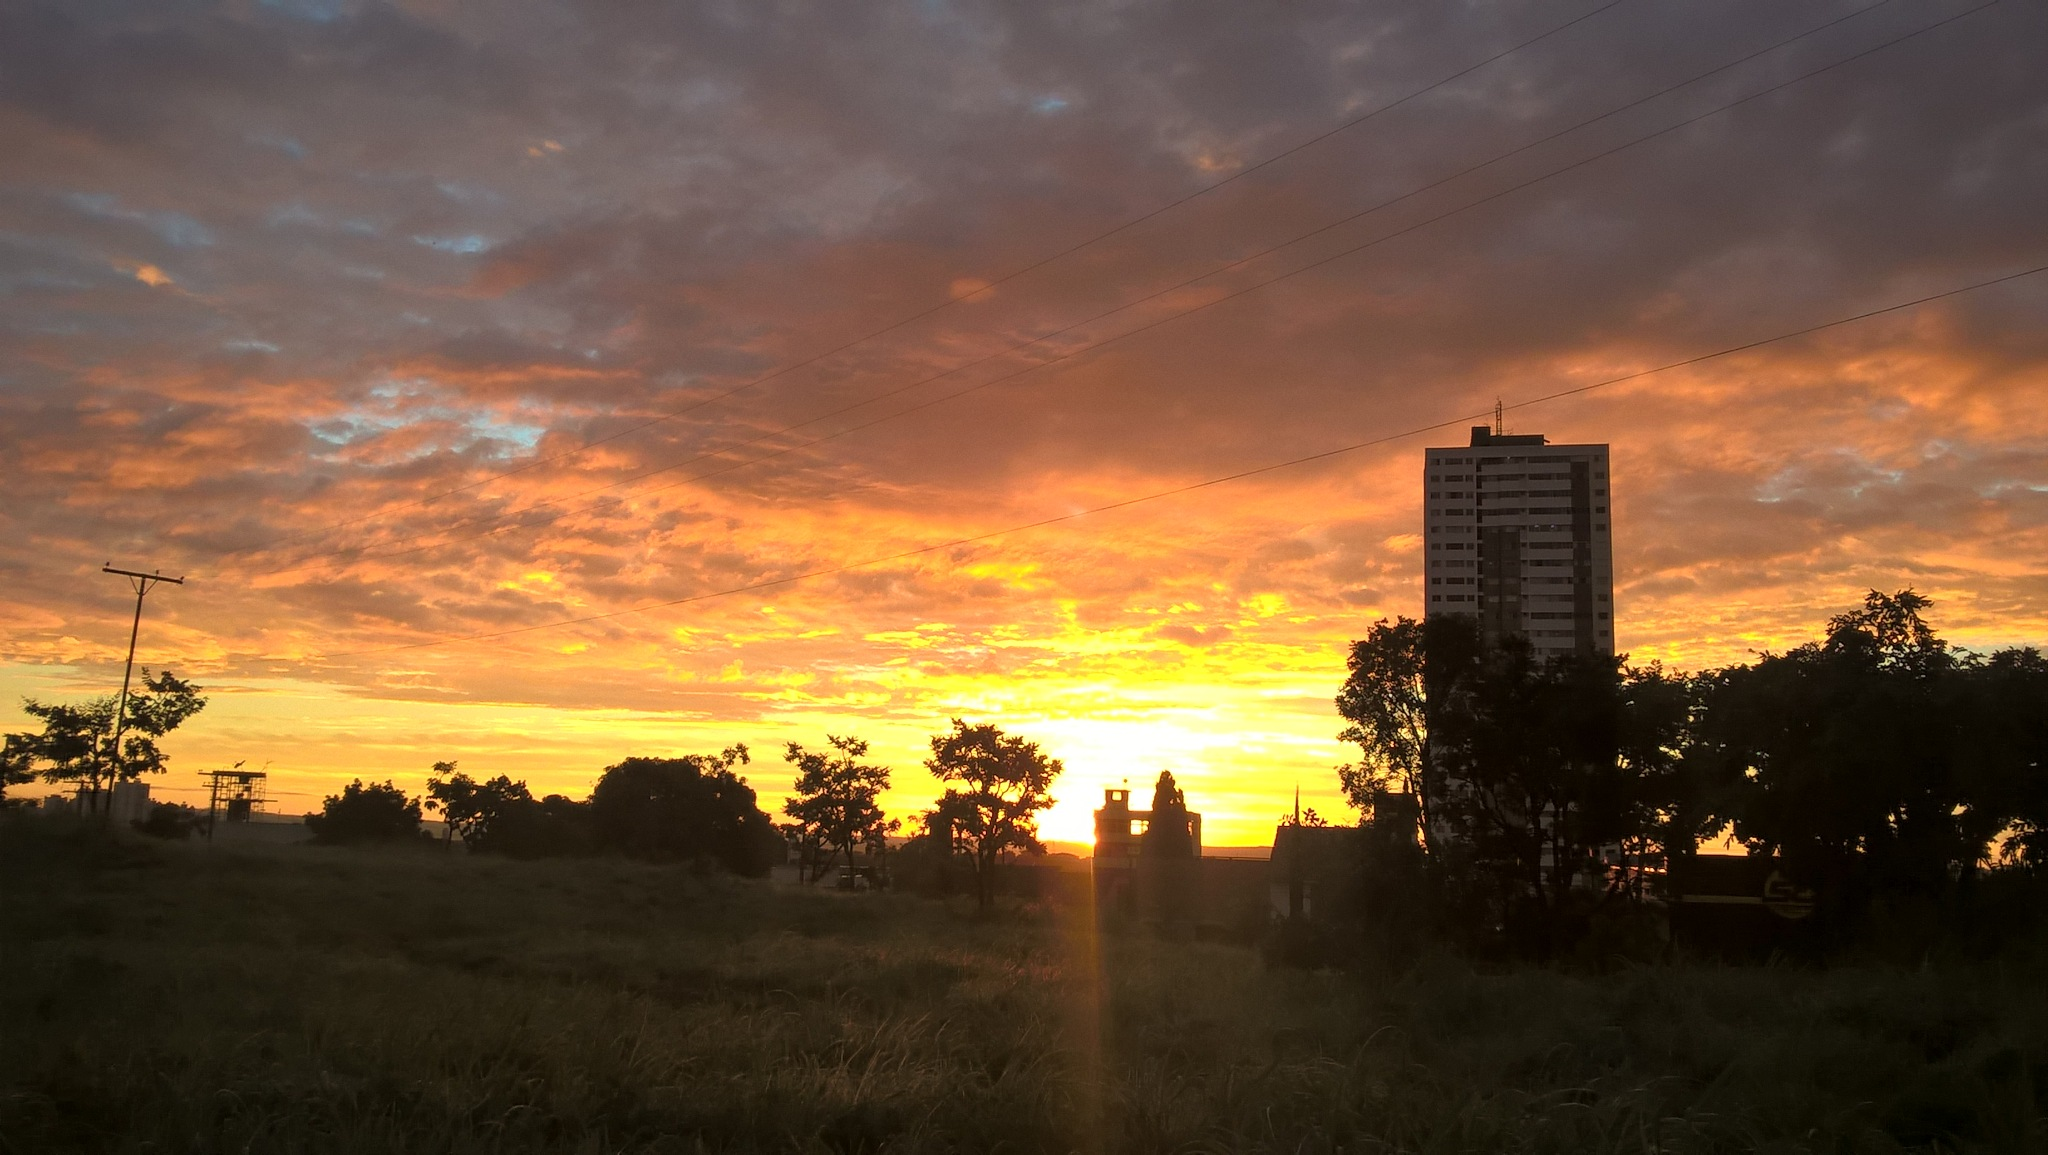 Goiânia sunrise by Alexandro Lima